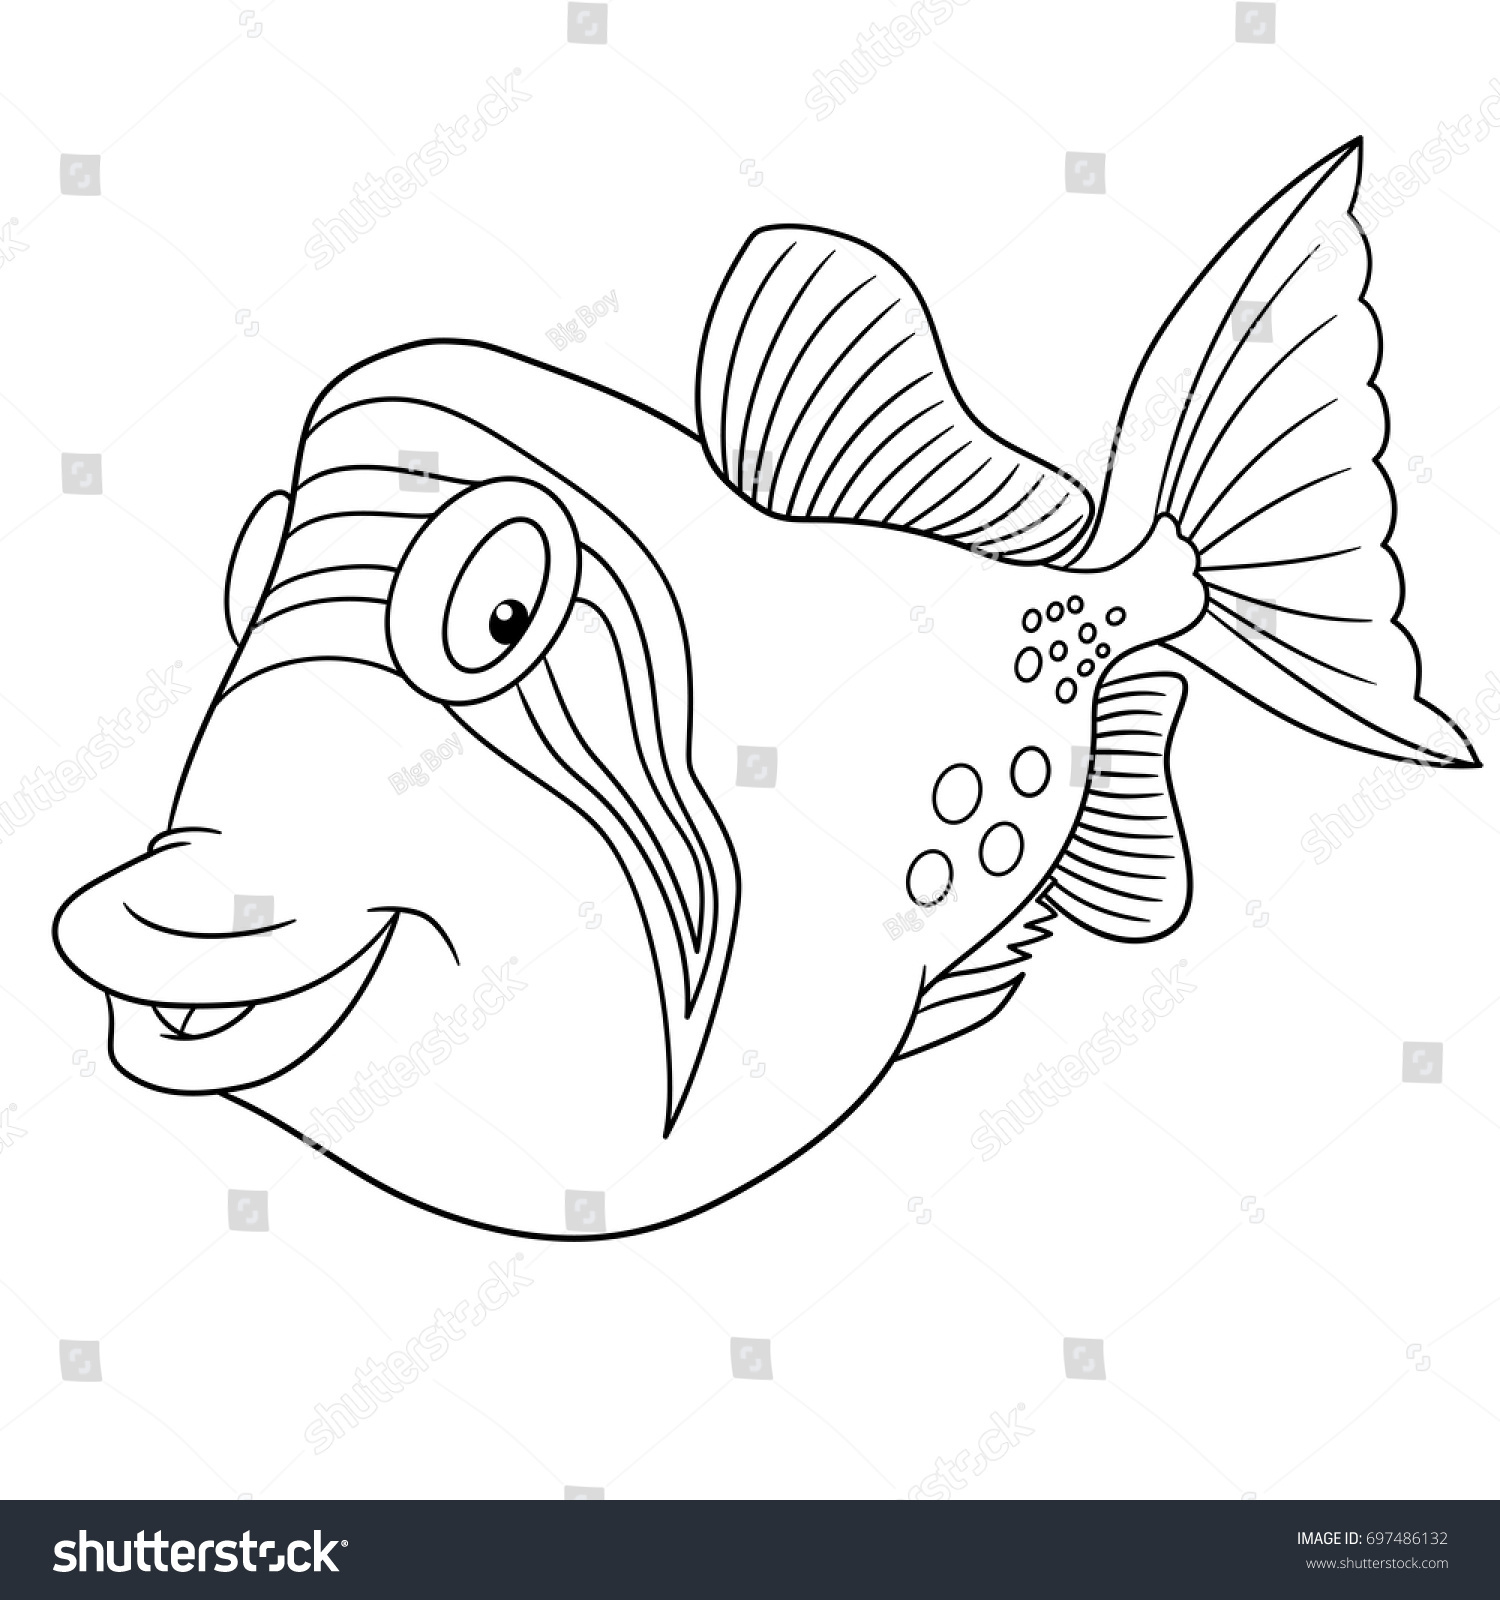 Coloring Page Cartoon Triggerfish Trigger Fish Stock Vector